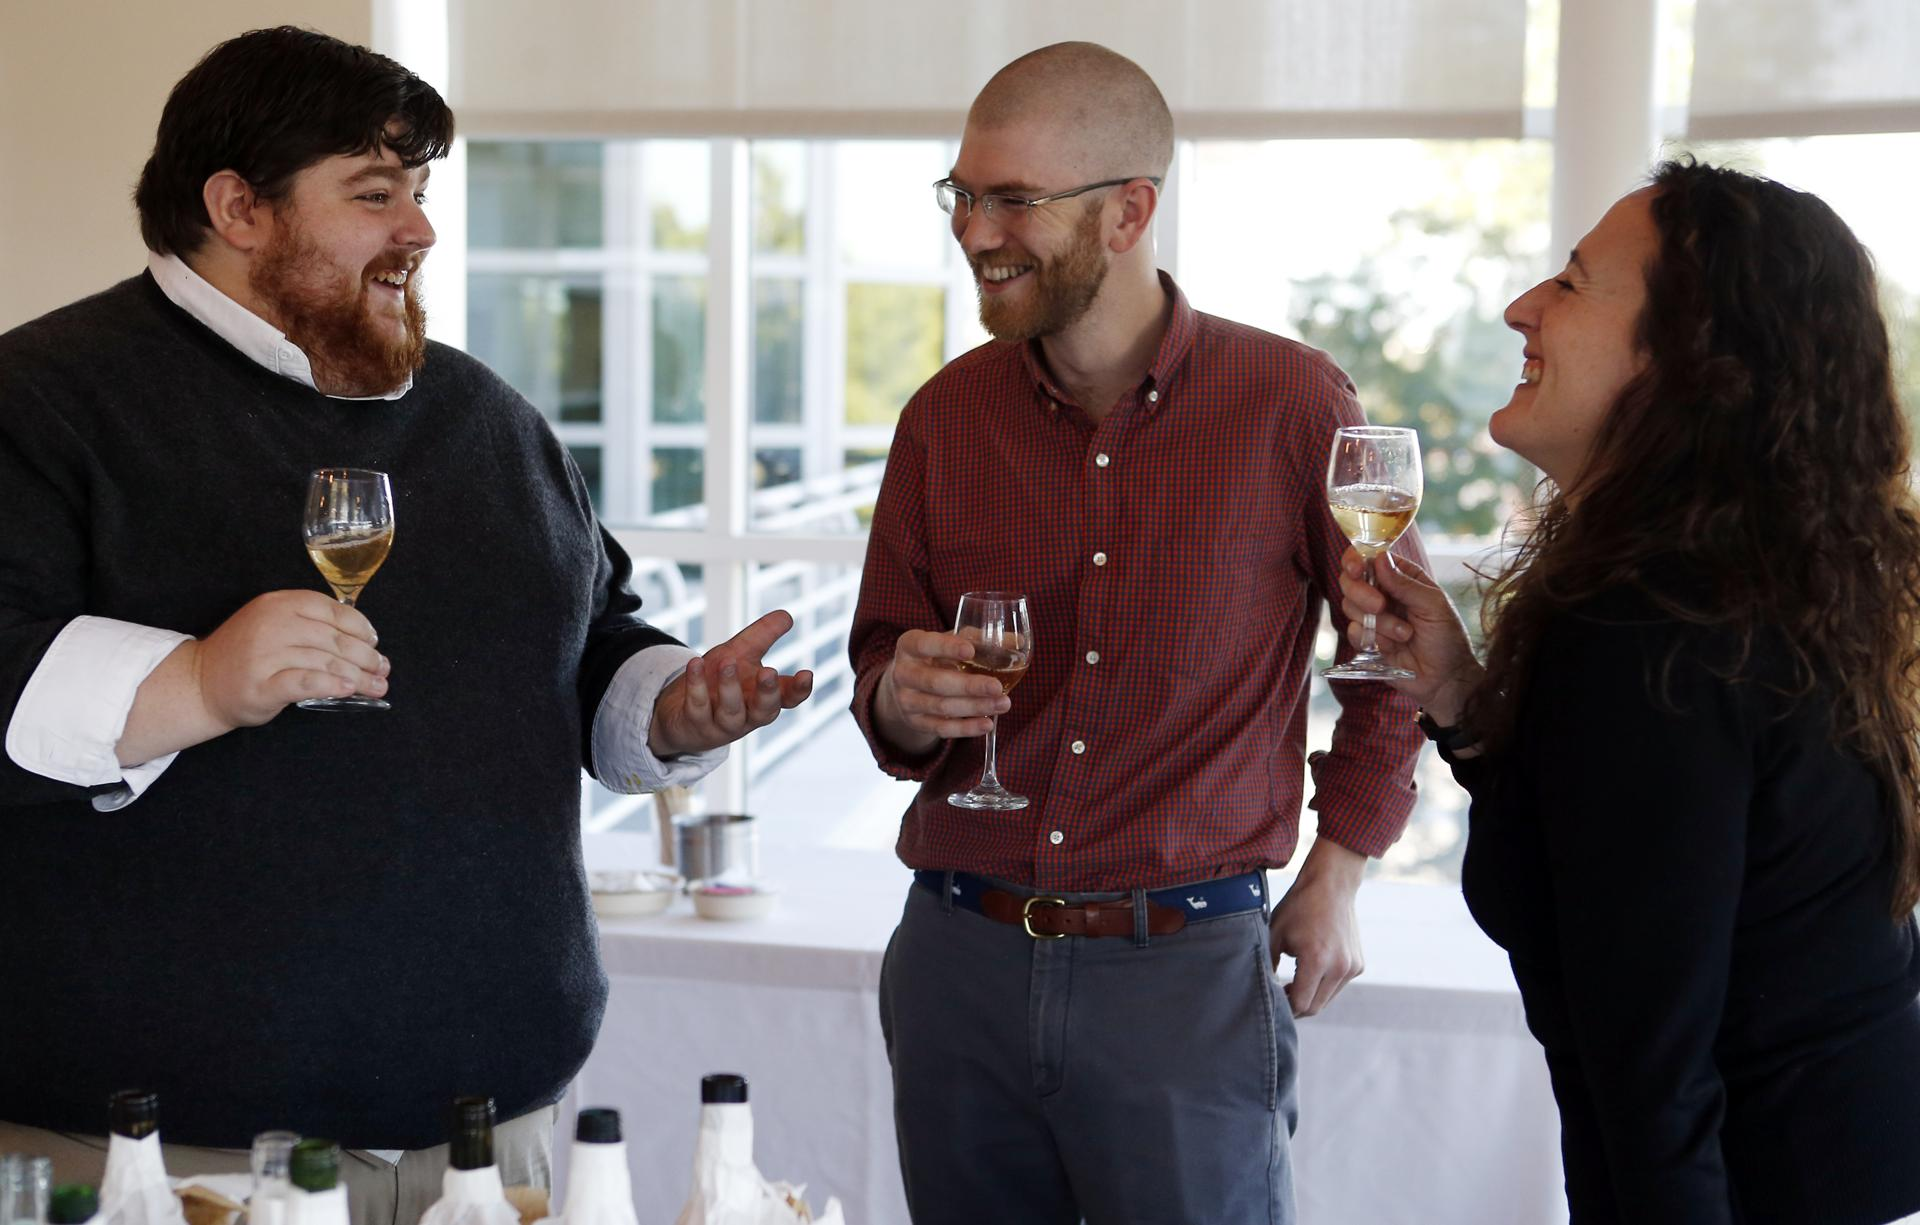 plonkapalooza tasters favorite wines the boston globe